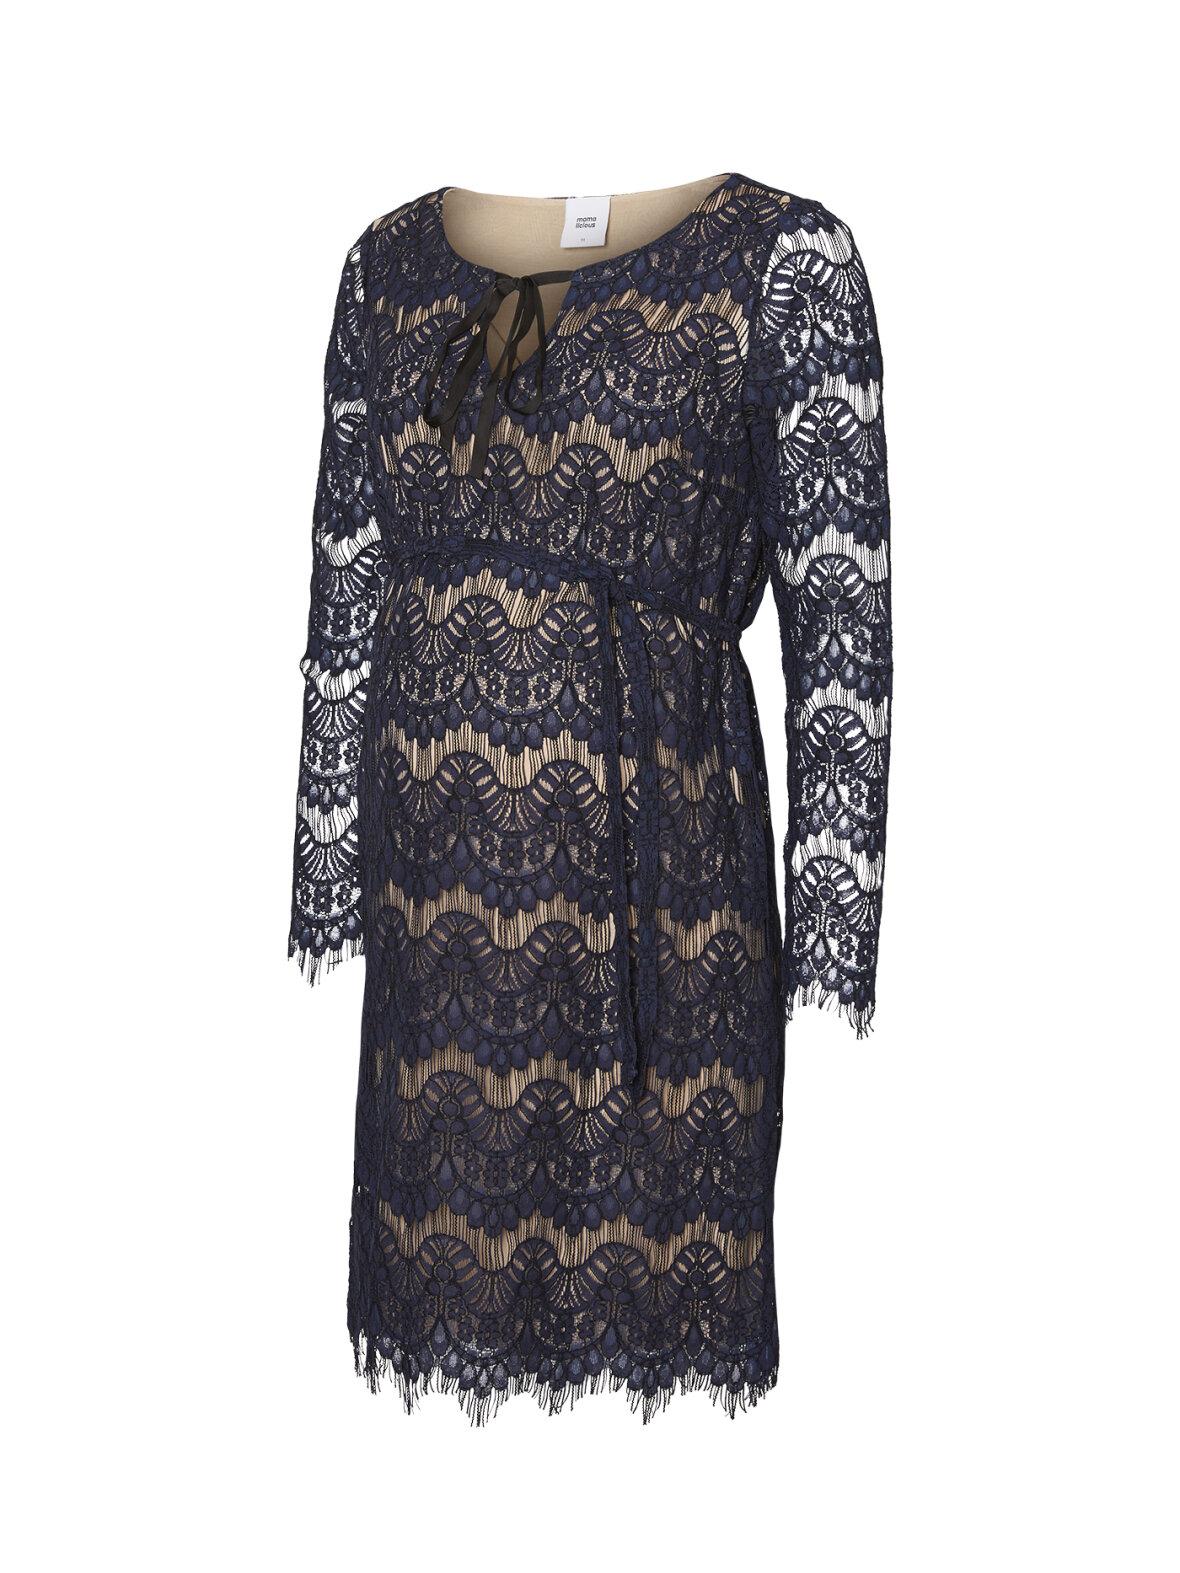 022155330ea4 Mamalicious - Nardin blonde kjole · Mamalicious - Nardin blonde kjole ...